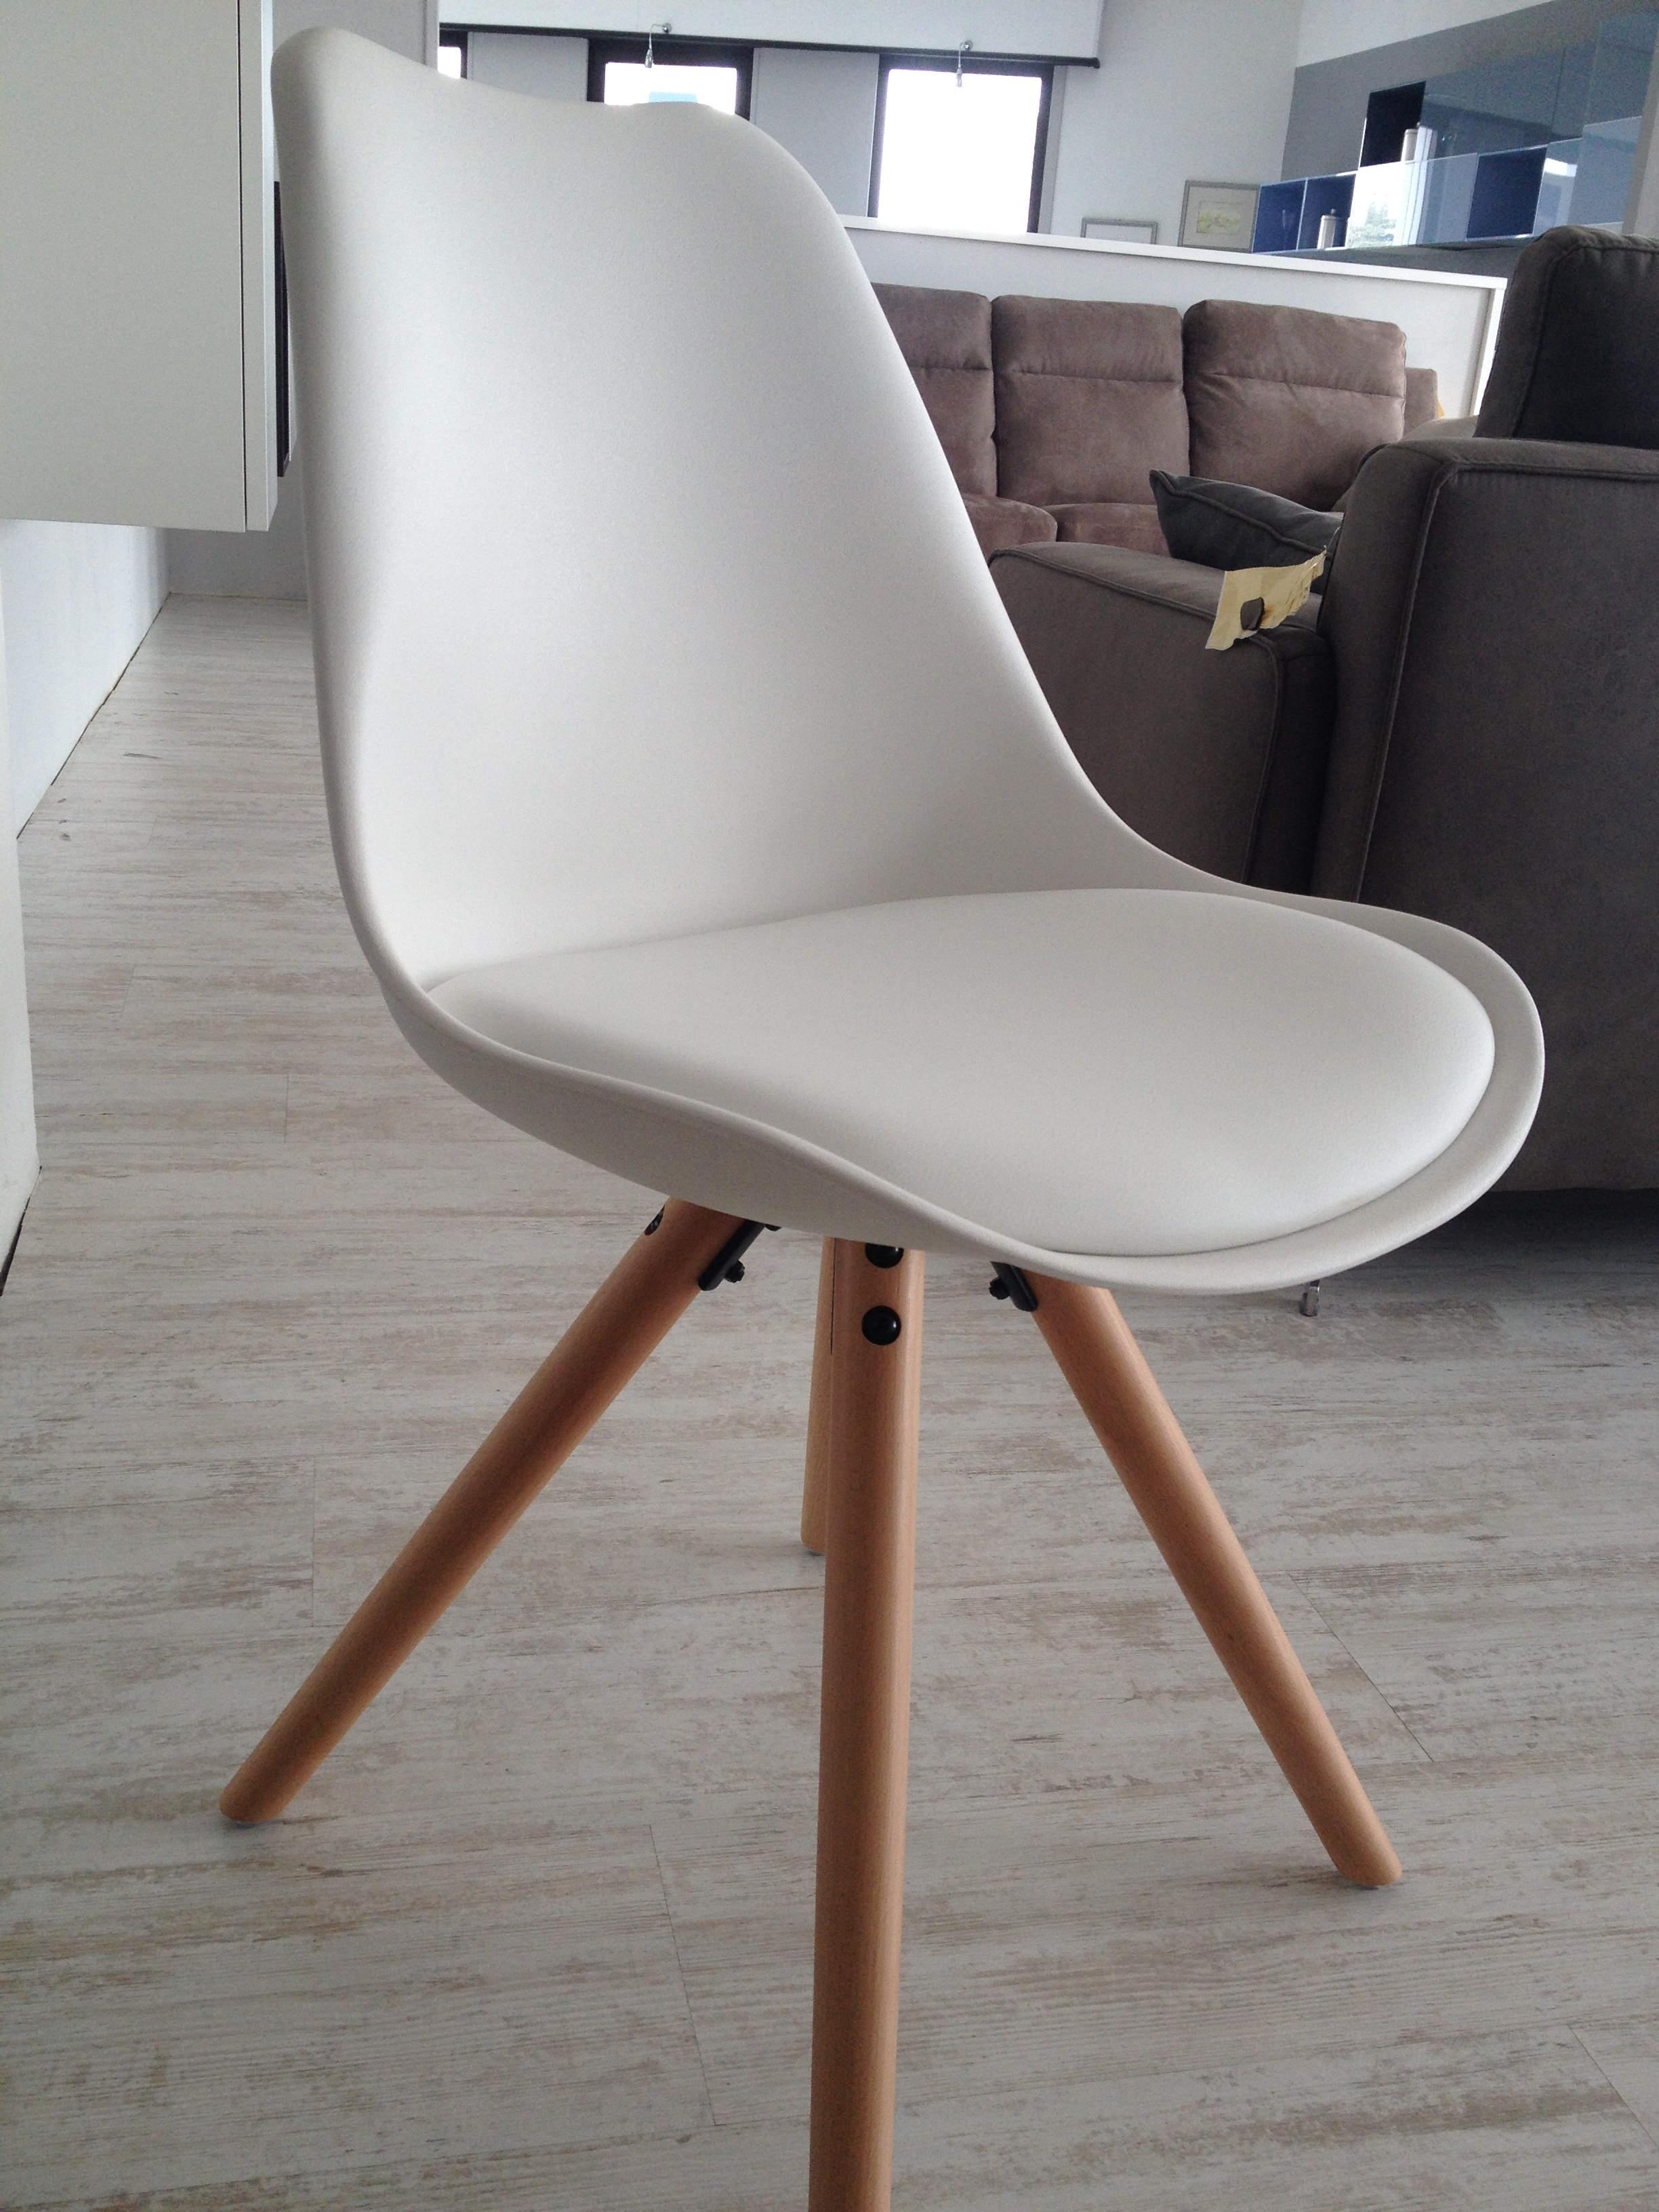 Sedia lars bianca con seduta ecopelle 31 sedie a for Sedie moderne prezzi